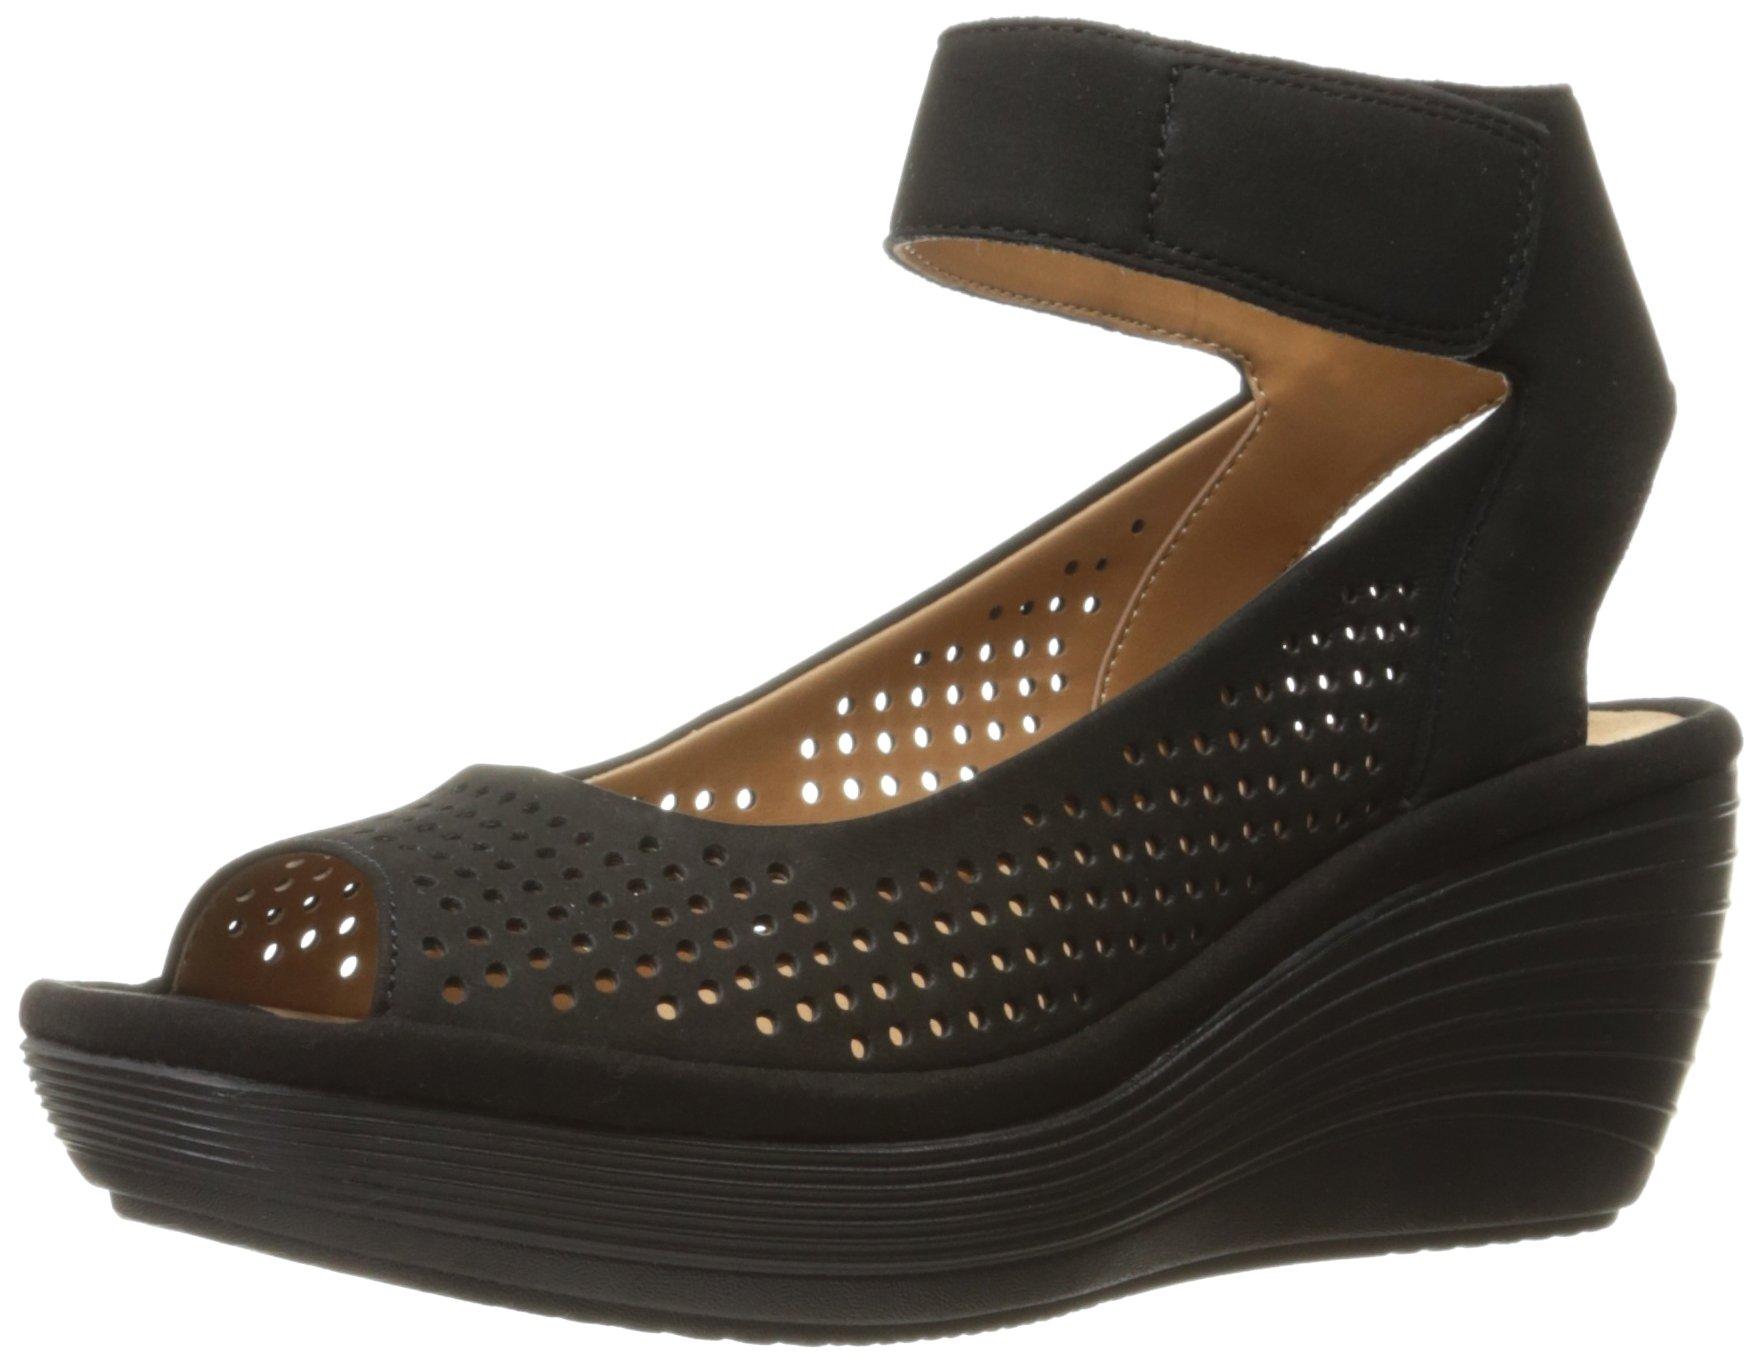 CLARKS Women's Reedly Salene Wedge Sandal, Black Nubuck, 7.5 M US by CLARKS